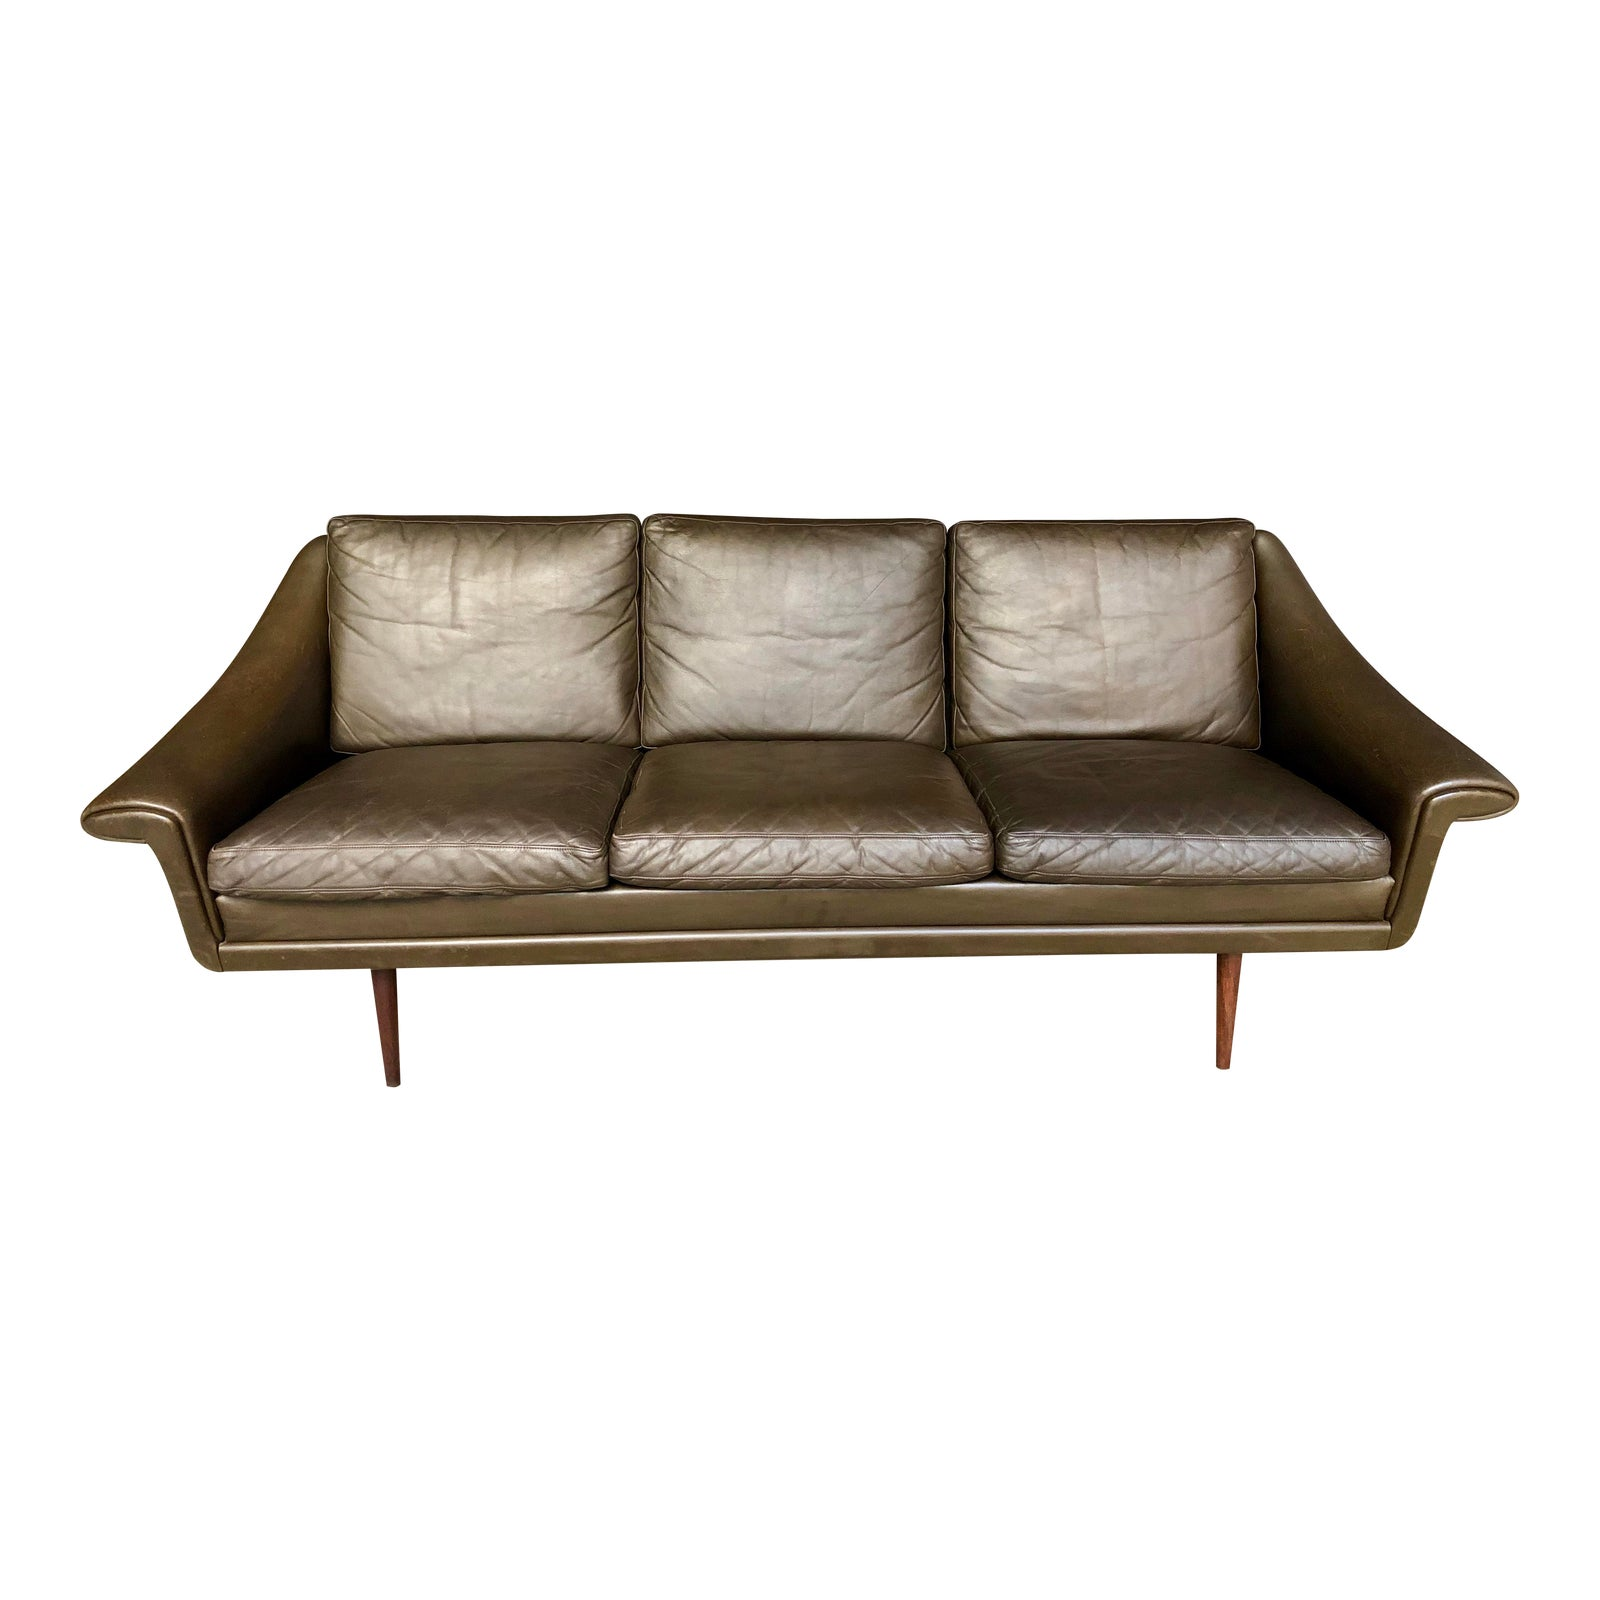 Mid Century Danish Modern Brown Leather Sofa Attr. To Svend Skipper - Three  Seat Couch Teak Legs